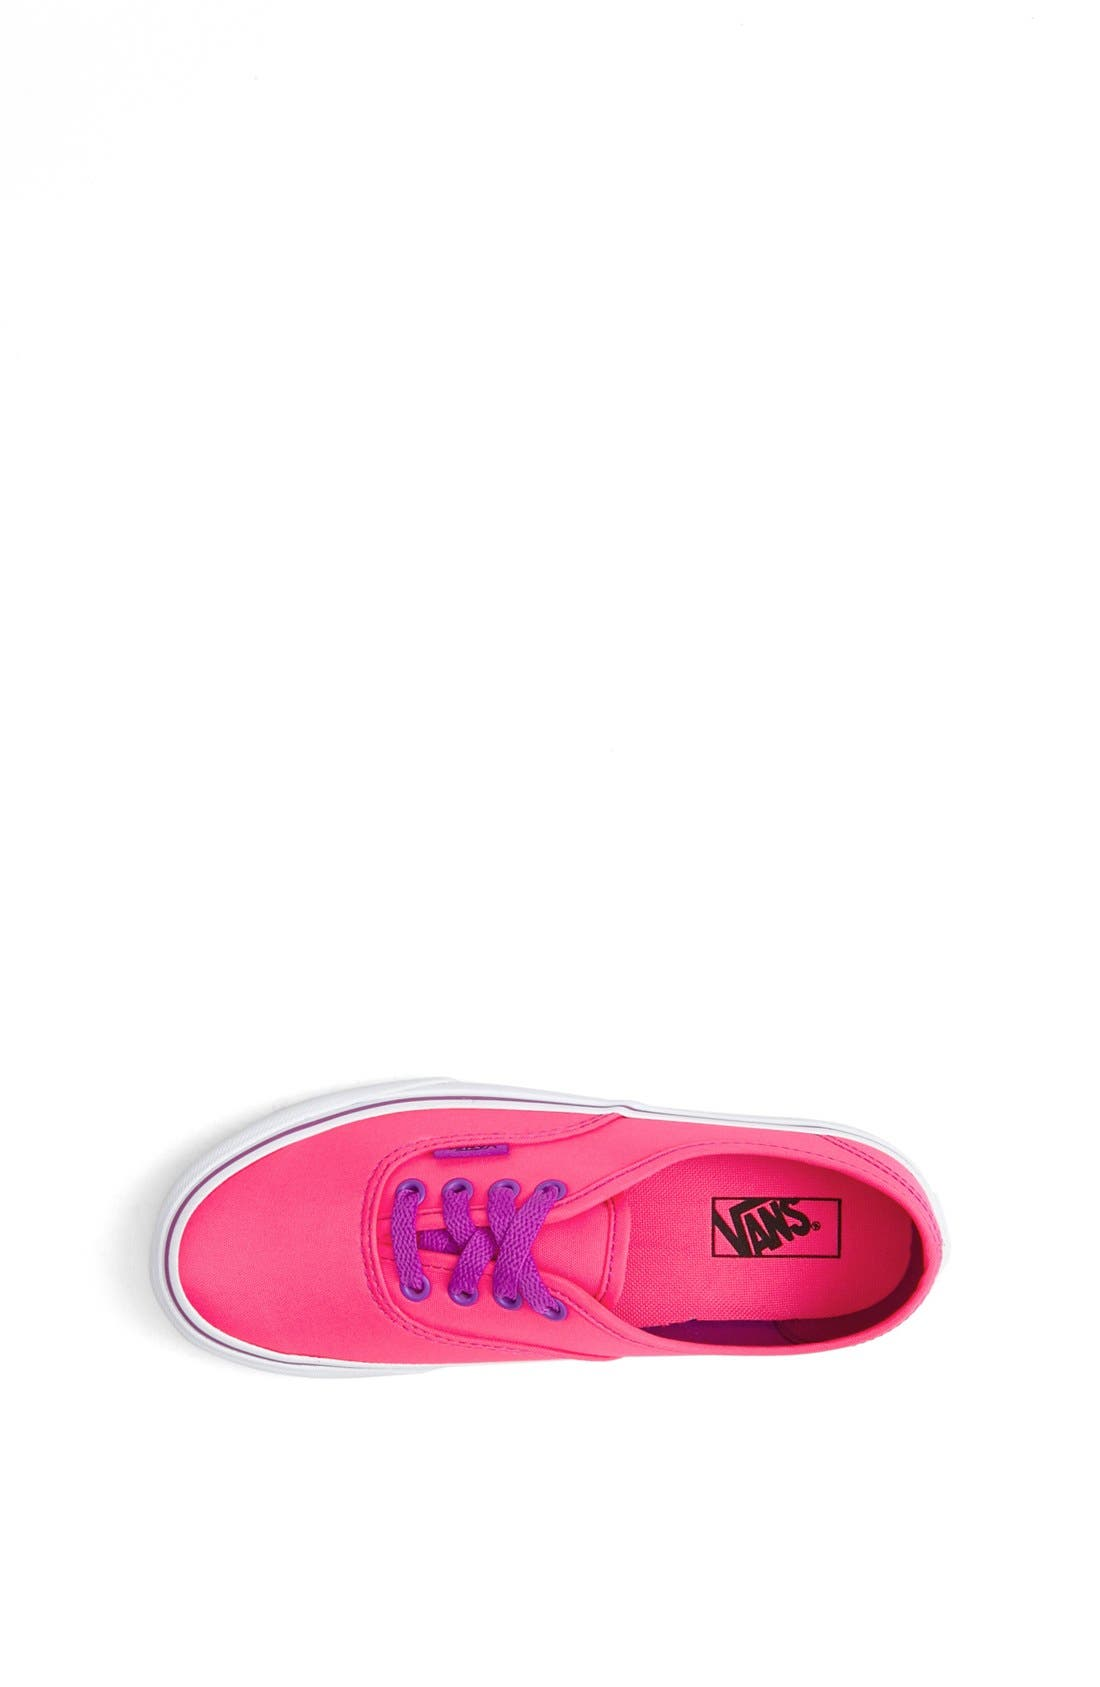 Alternate Image 3  - Vans 'Authentic' Neon Sneaker (Toddler, Little Kid & Big Kid)